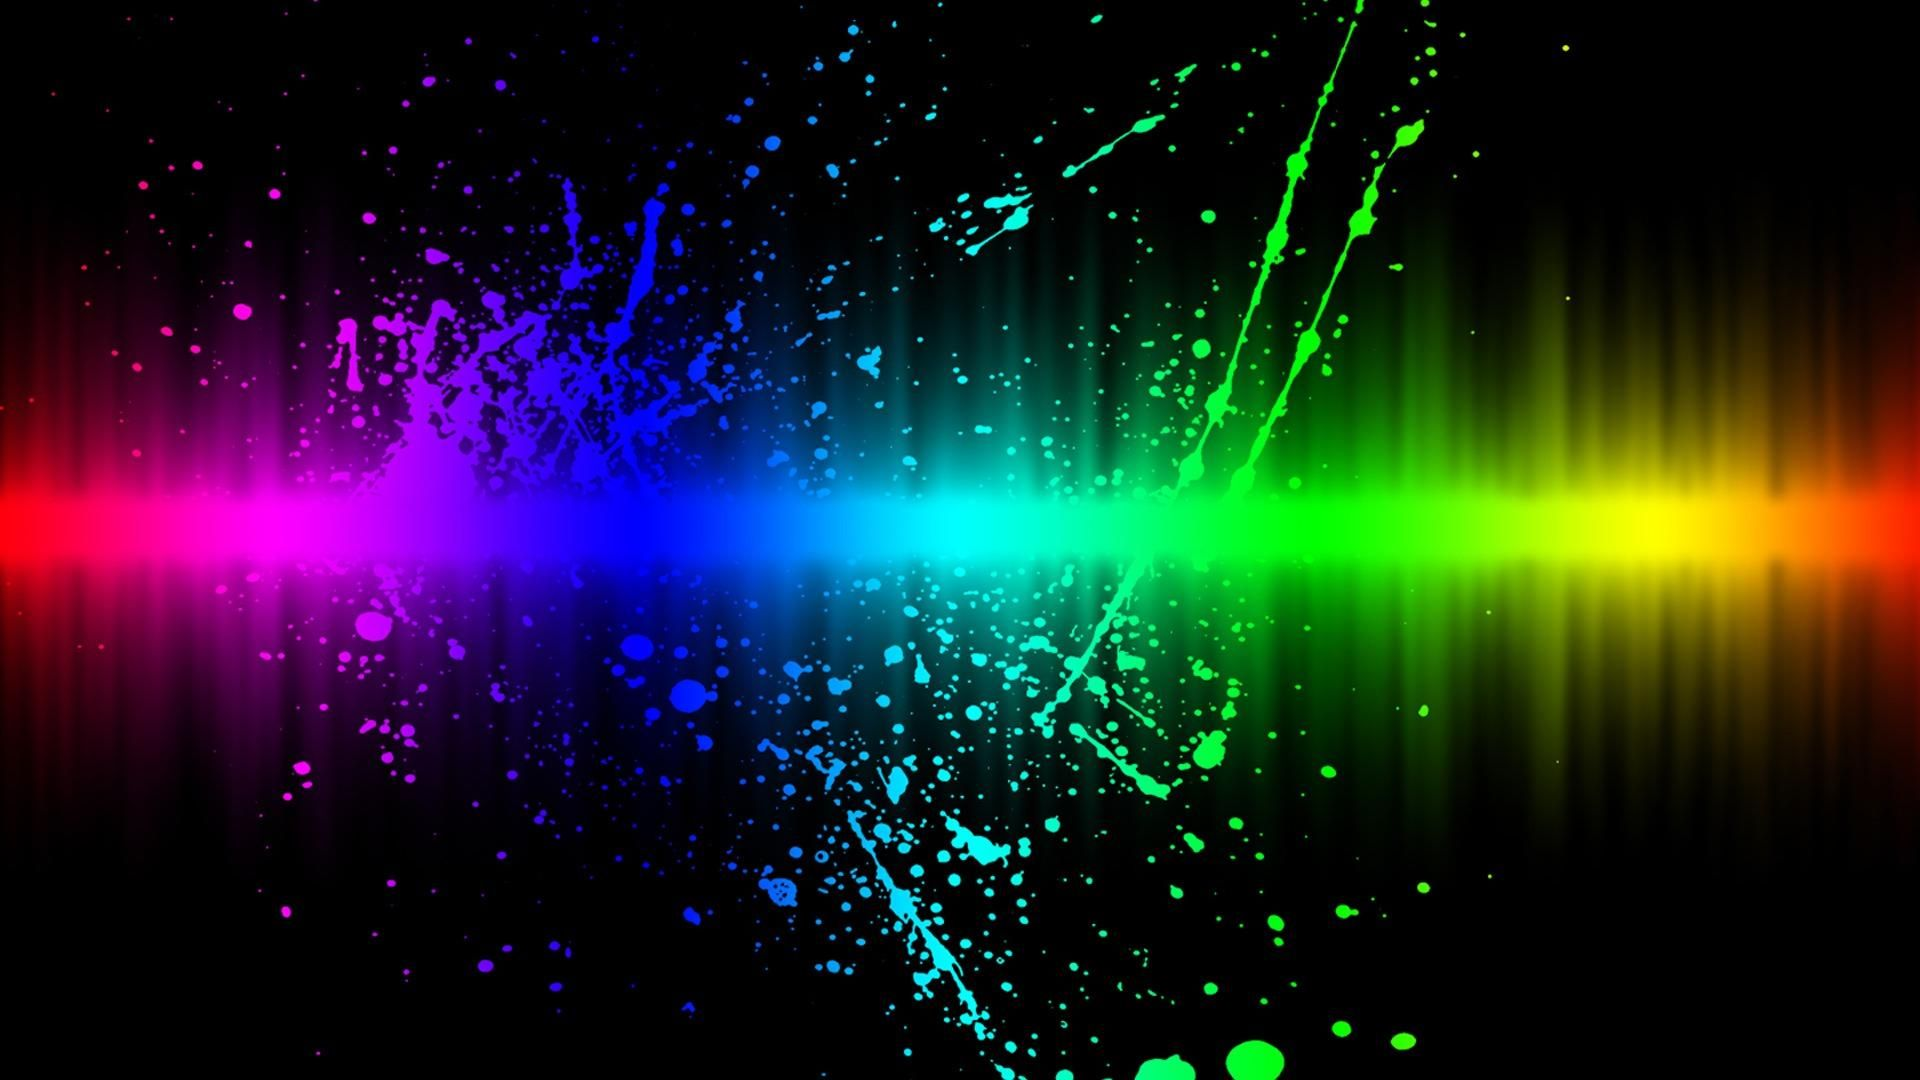 Best Desktop Backgrounds Ever Hd Best Wallpaper Hd Cool Desktop Backgrounds Rainbow Wallpaper Cool Backgrounds